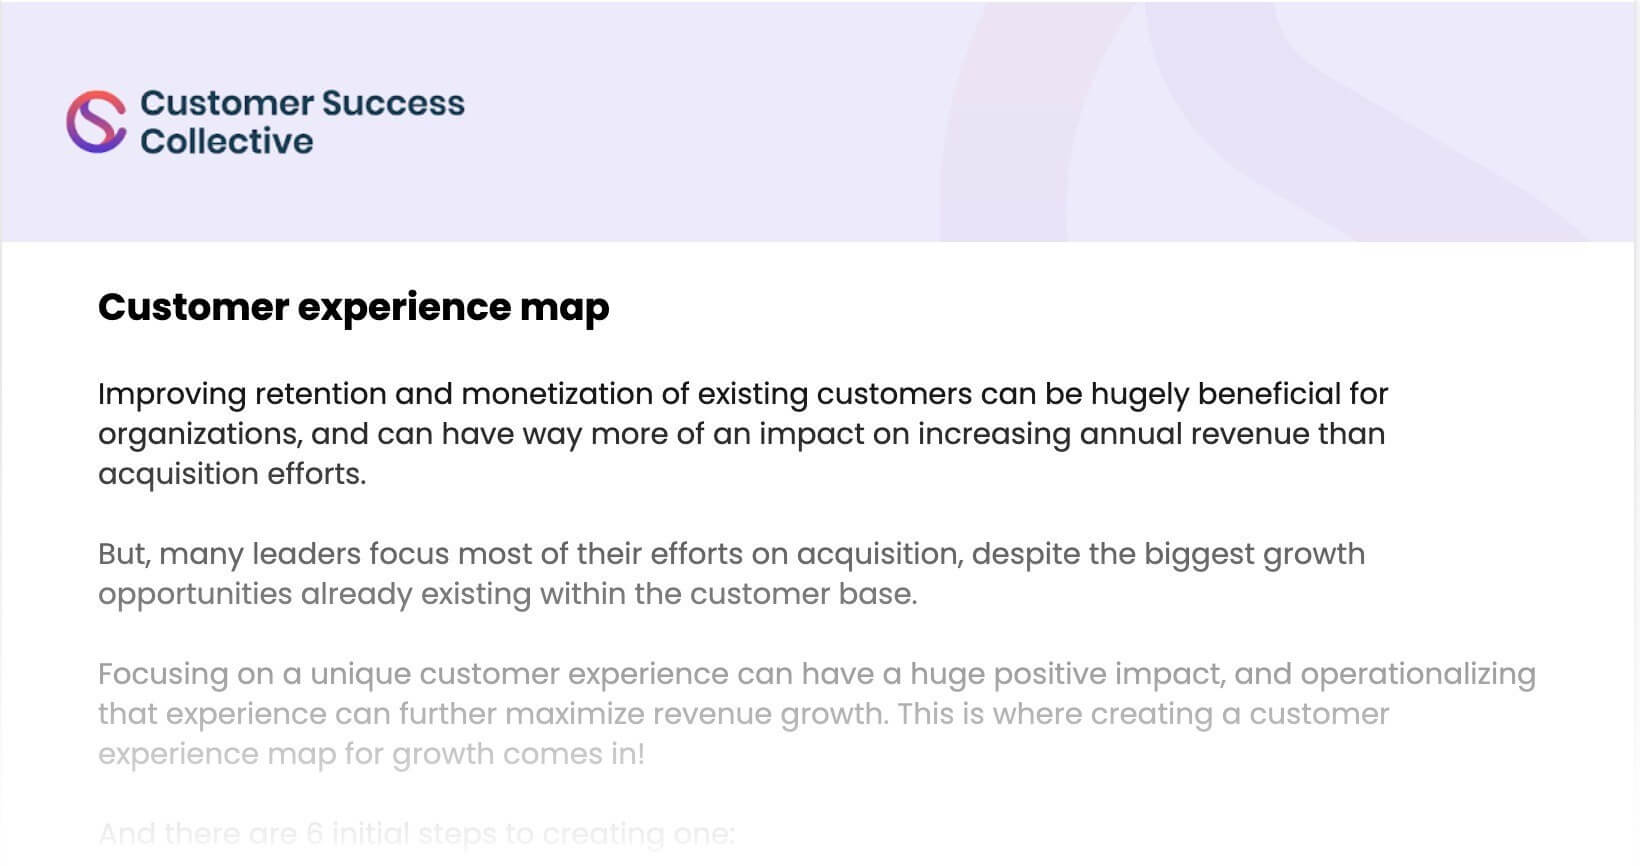 Customer experience map